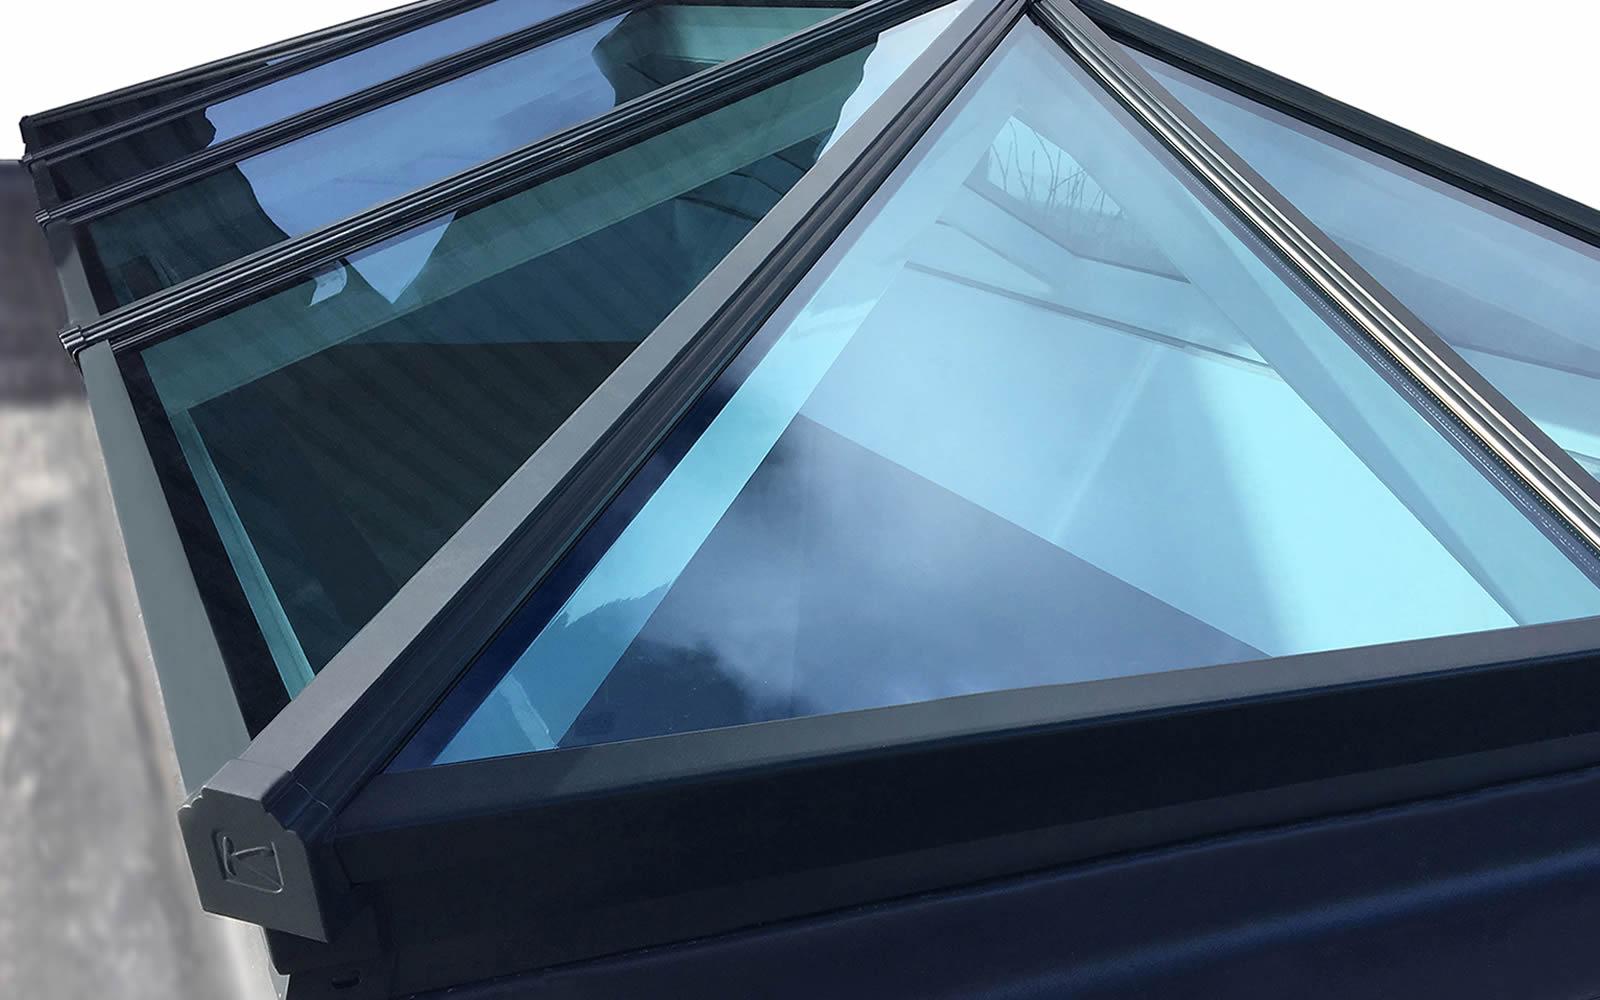 Belvedere Lantern Roof